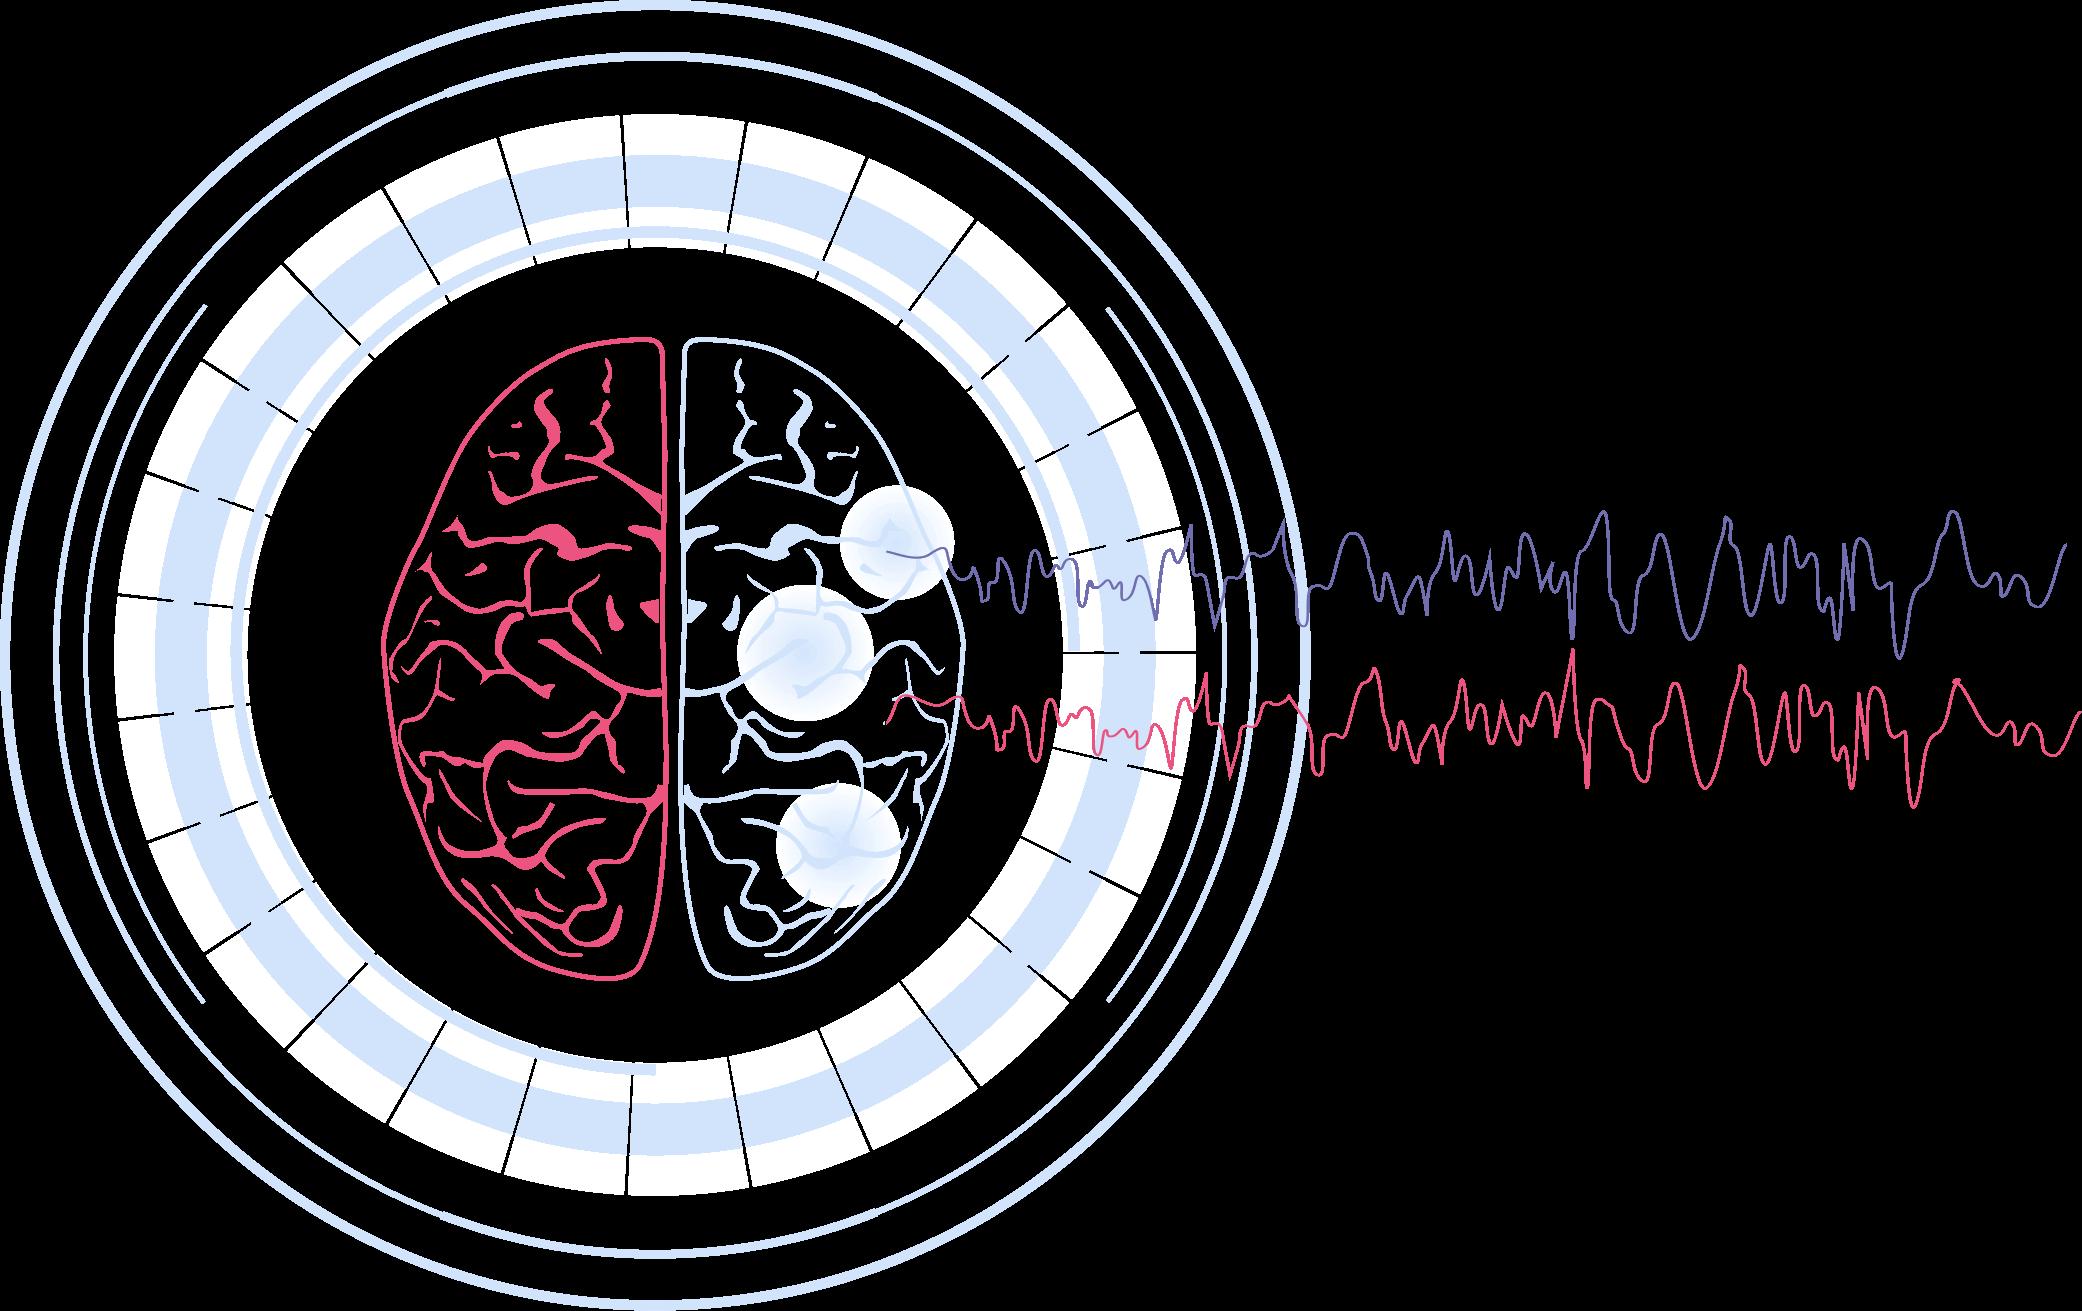 Group-708 - Neuroscience Software